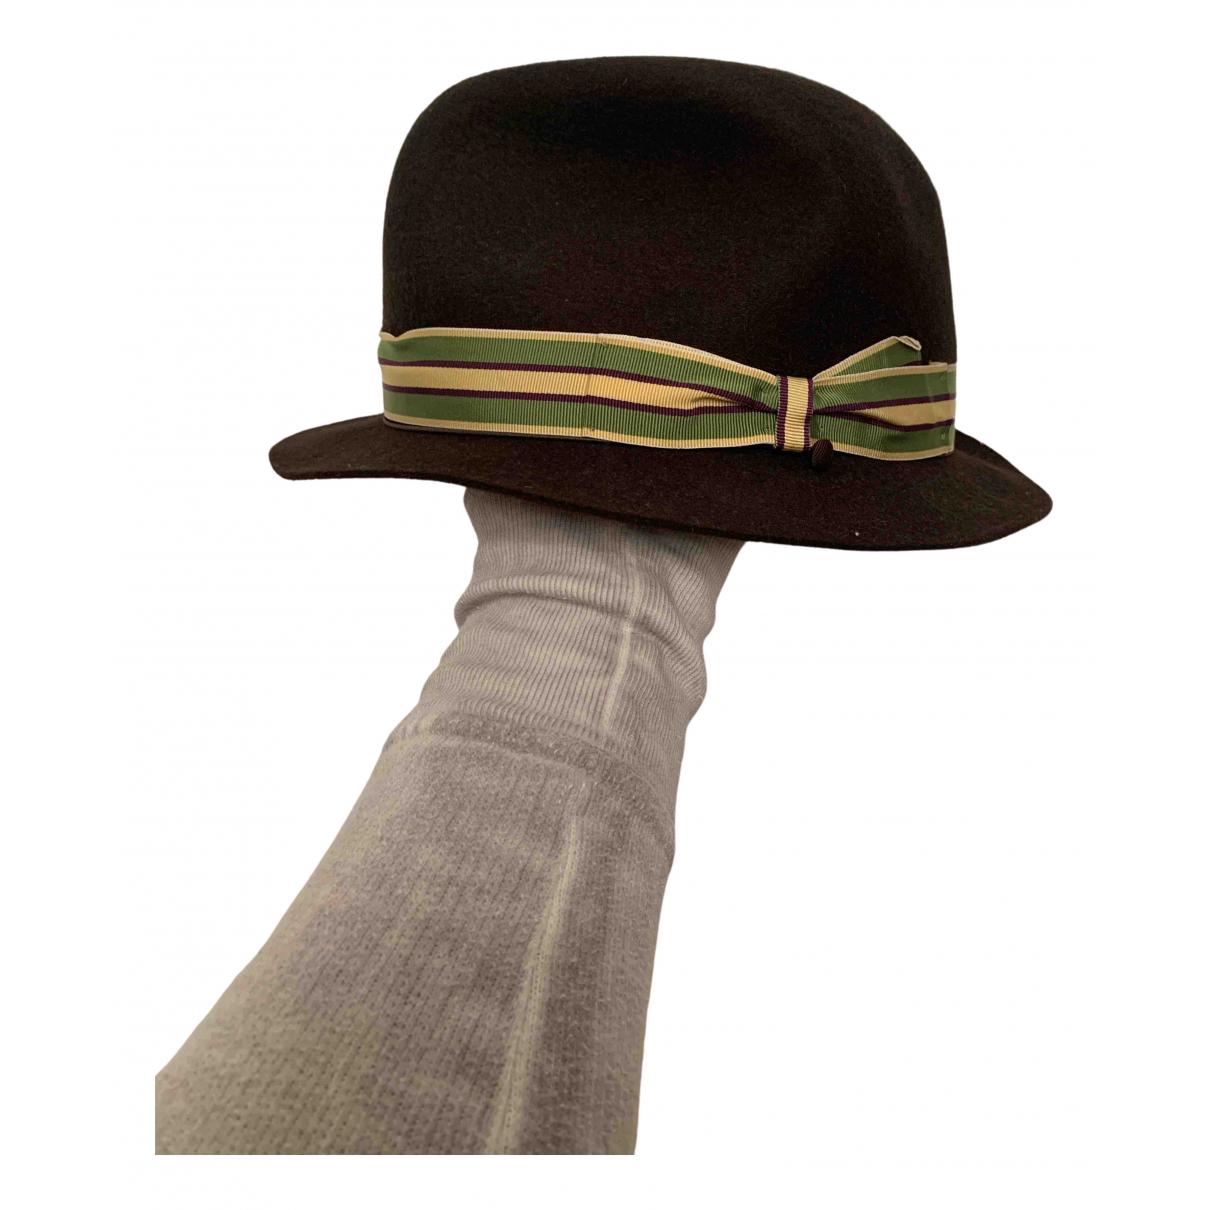 Sombrero / gorro de Lana Borsalino